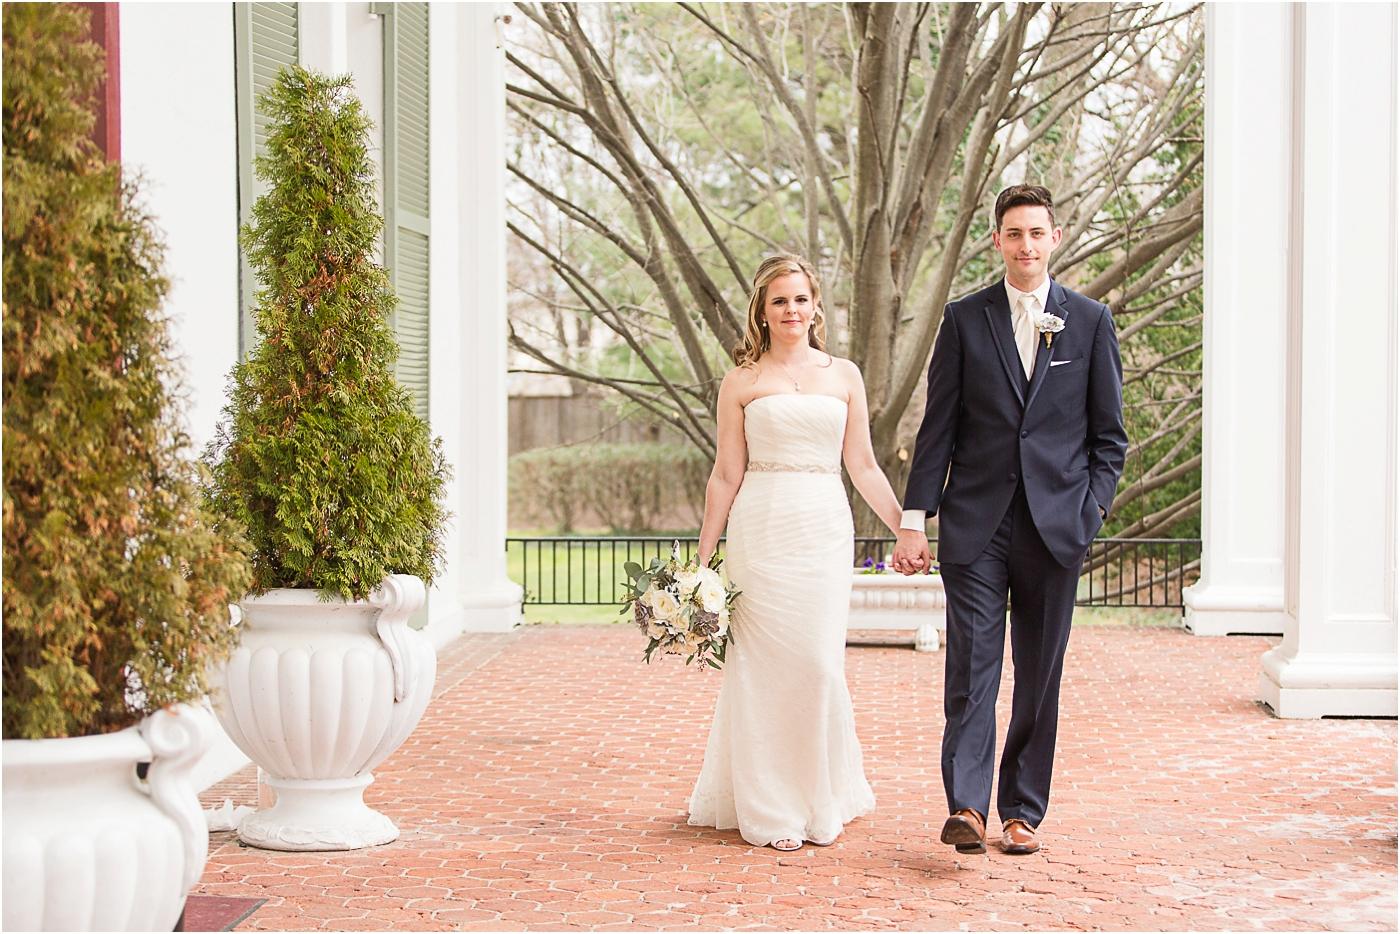 Greyrock-mansion-wedding-63.jpg